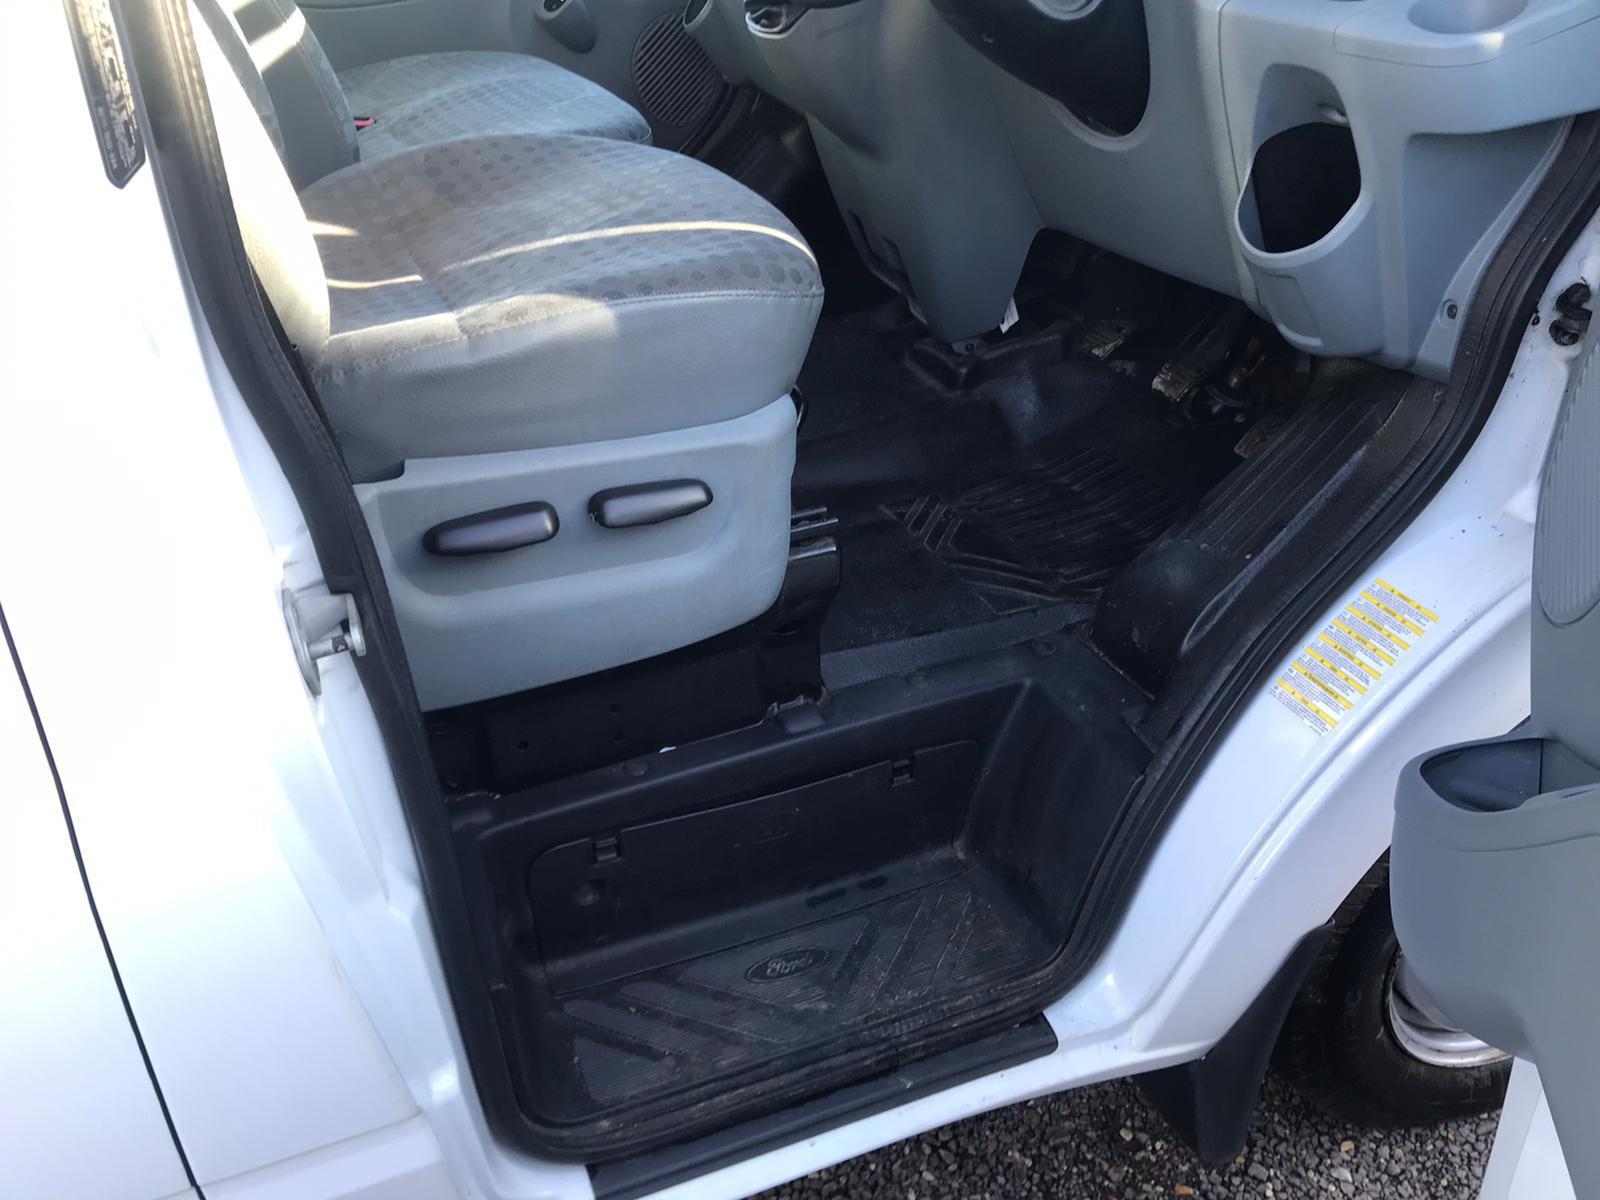 (RESERVE MET) Ford Transit 2.2 TDCI 100 T260 2014 Model - SWB - Low Roof -NO VAT SAVE 20% - Image 14 of 22